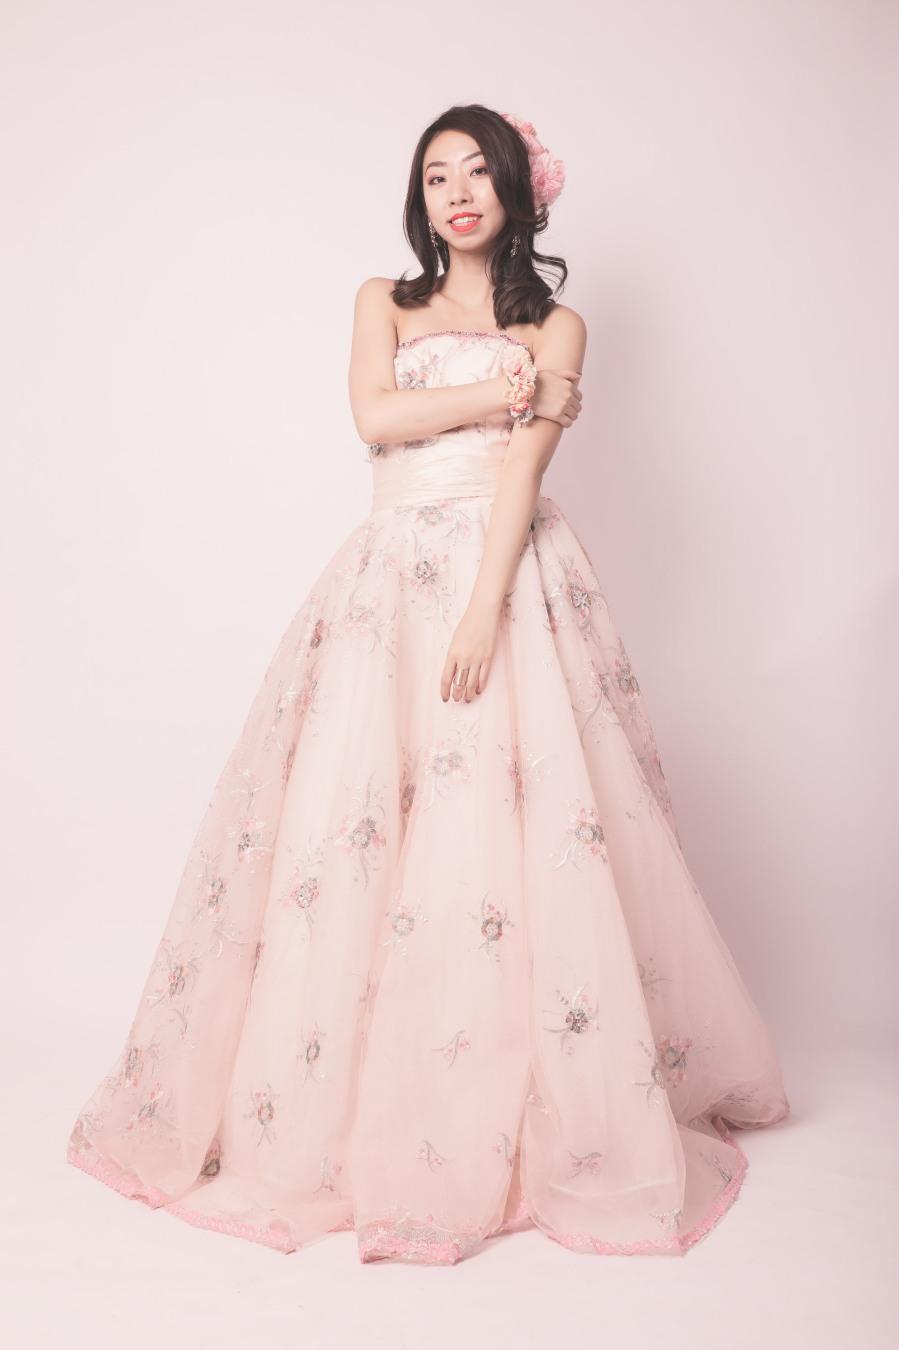 韓式新娘化妝髮型攝影_bridal_wedding_Korea_makeup_hairstyling_Top_MUA_paulstylist_photography_hk-64